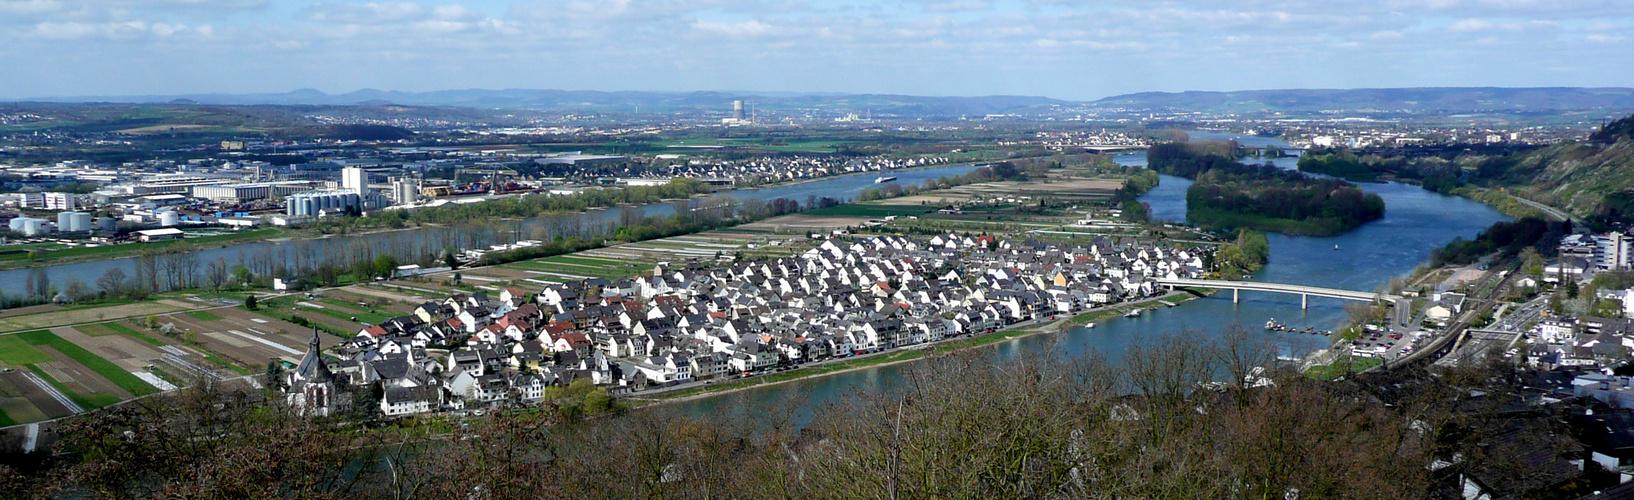 Insel Niederwerth im Rhein